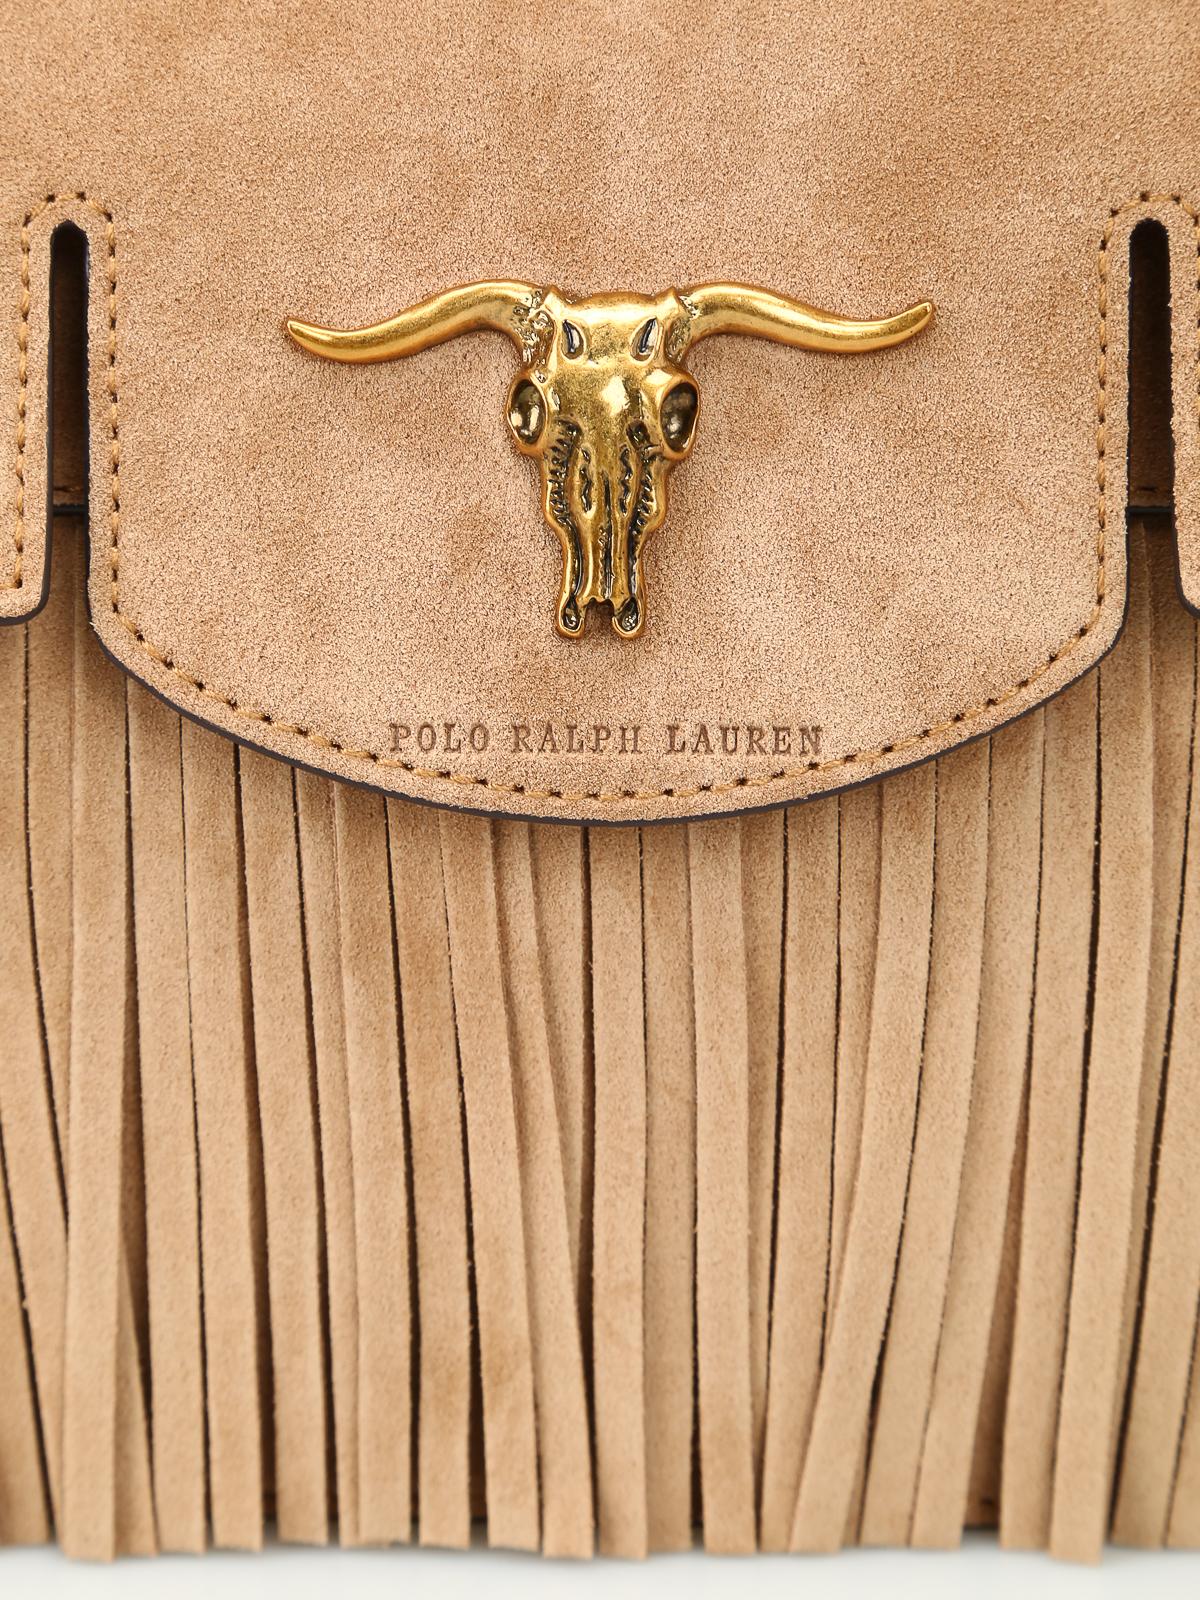 167c21e8b5 Polo Ralph Lauren - Schooly small suede satchel bag - cross body ...